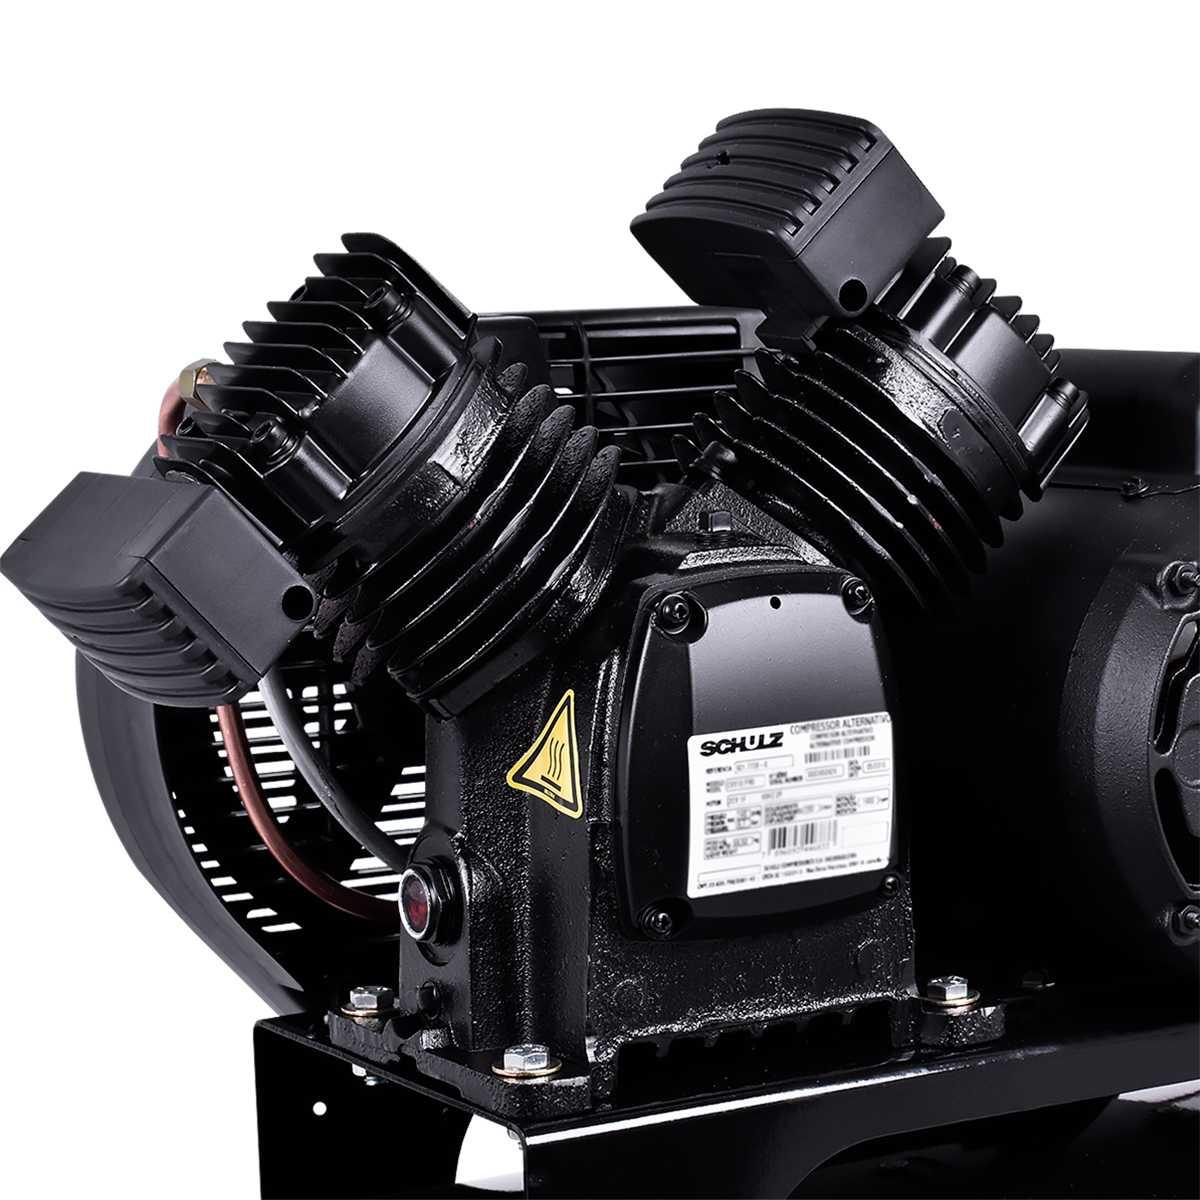 Compressor de Ar 100L 10Pcm Csv10/100 Pro Schulz - 127V